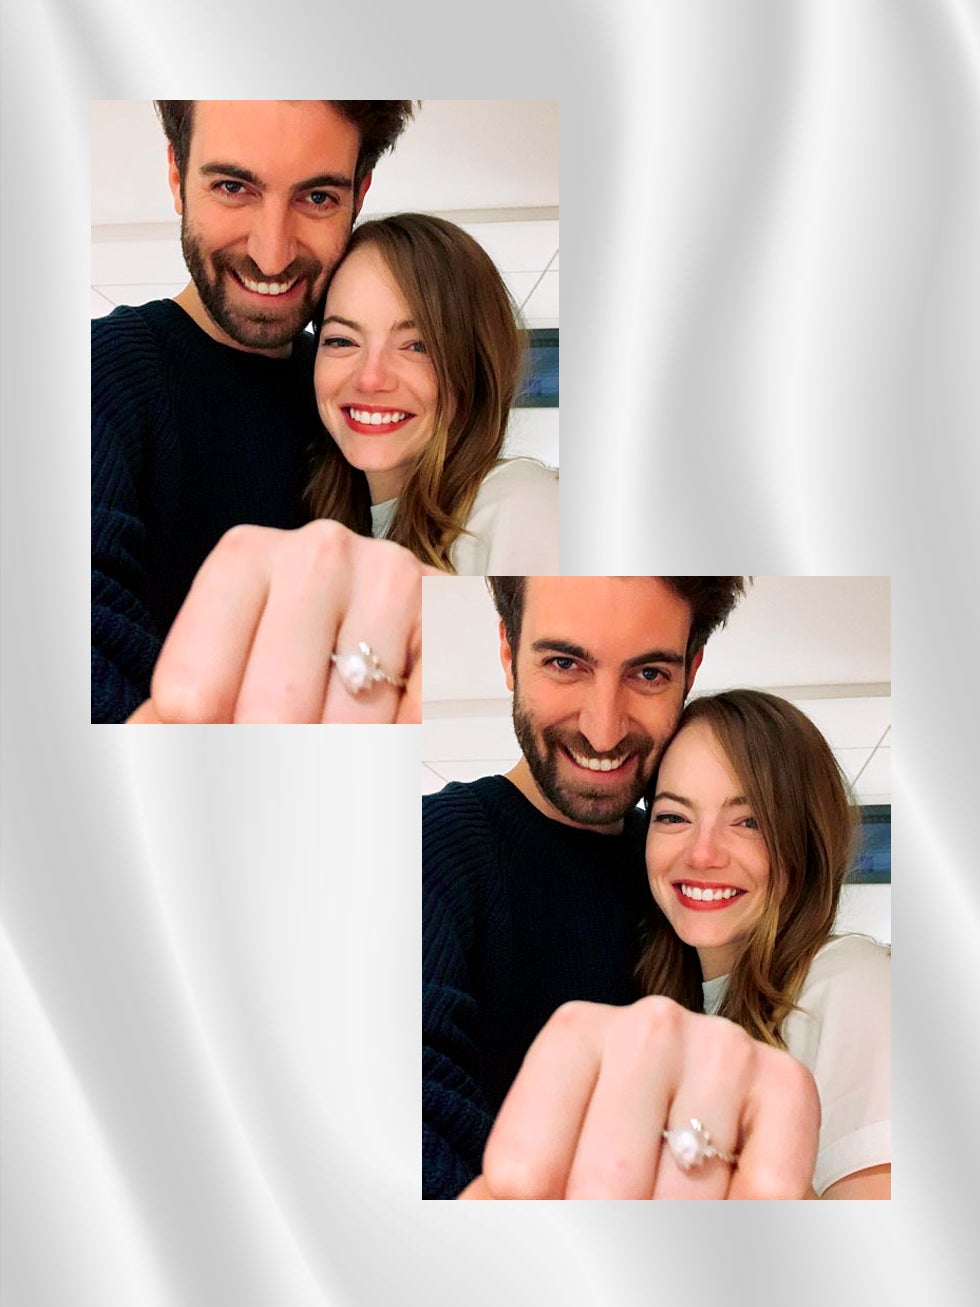 emma-stone-engagement-ring-domino-alt